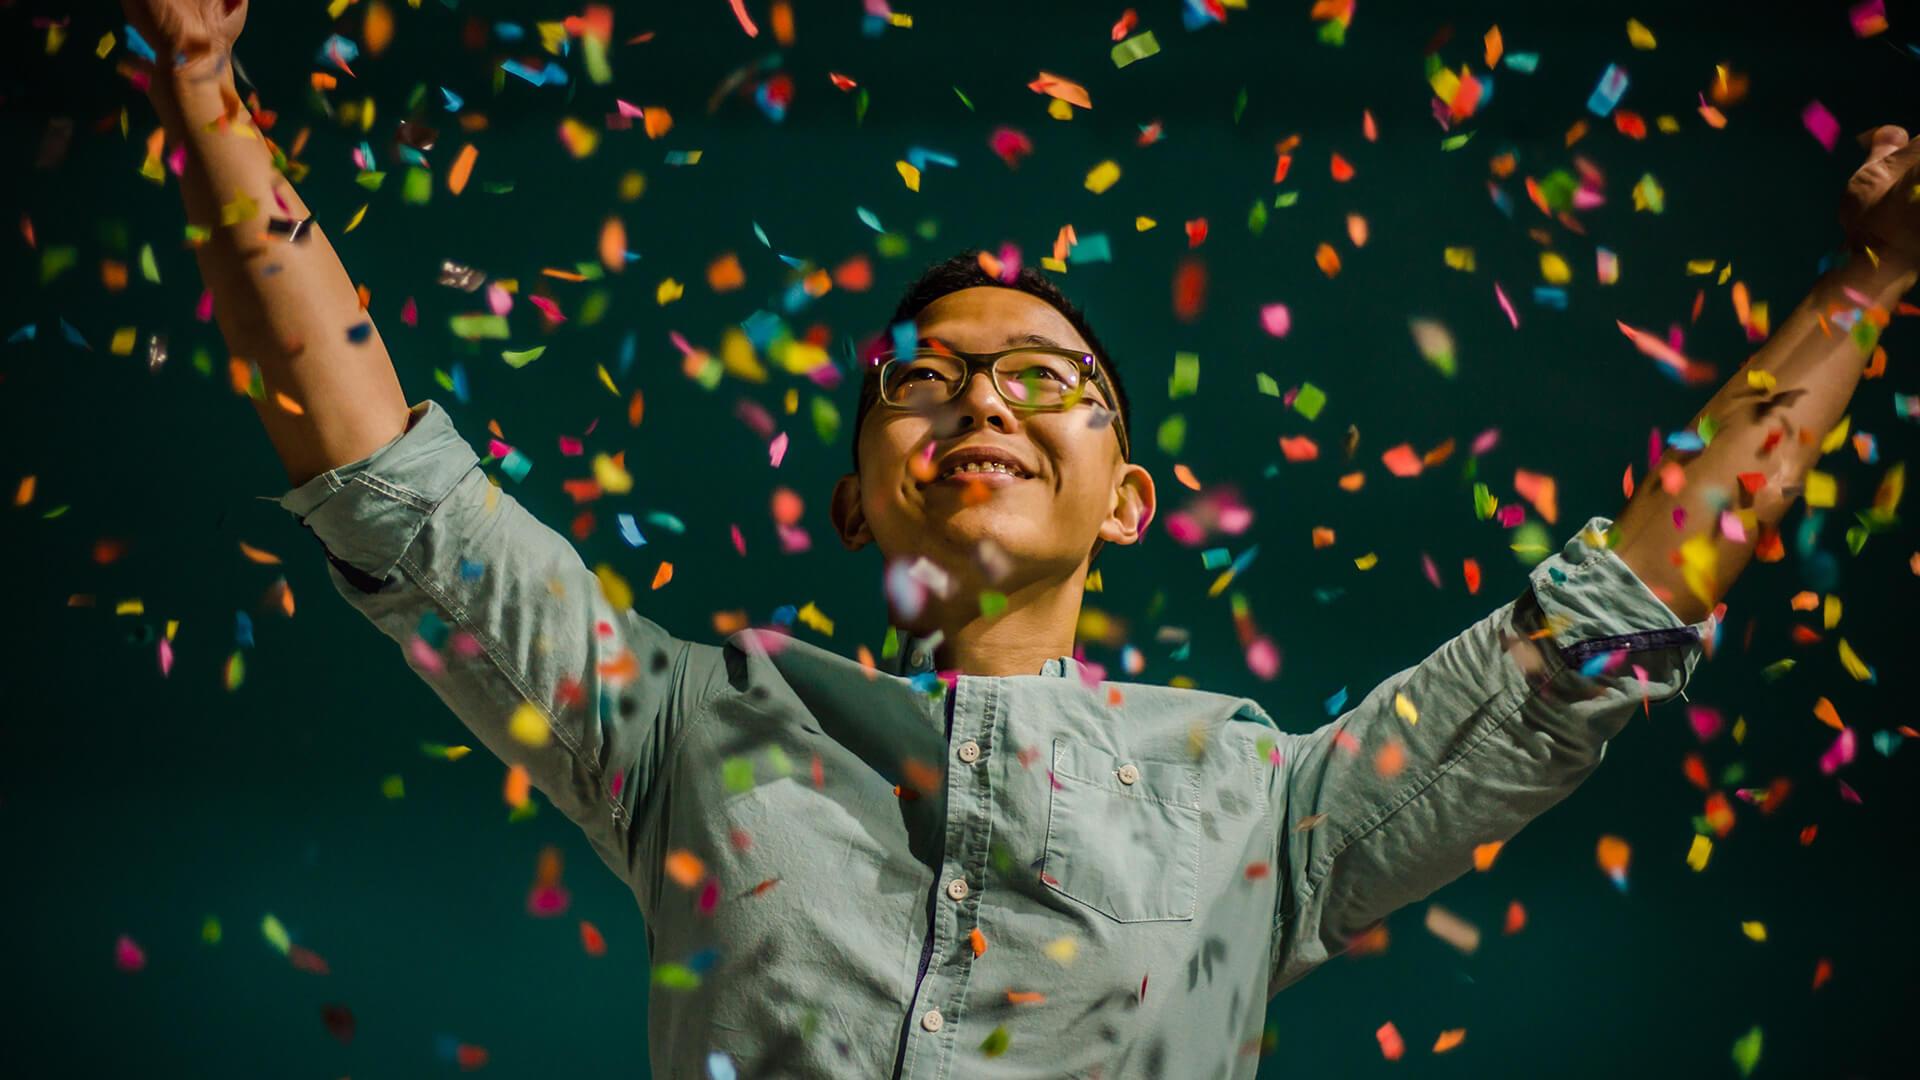 5 Creencias Tóxicas Que No Te Permiten Ser Feliz